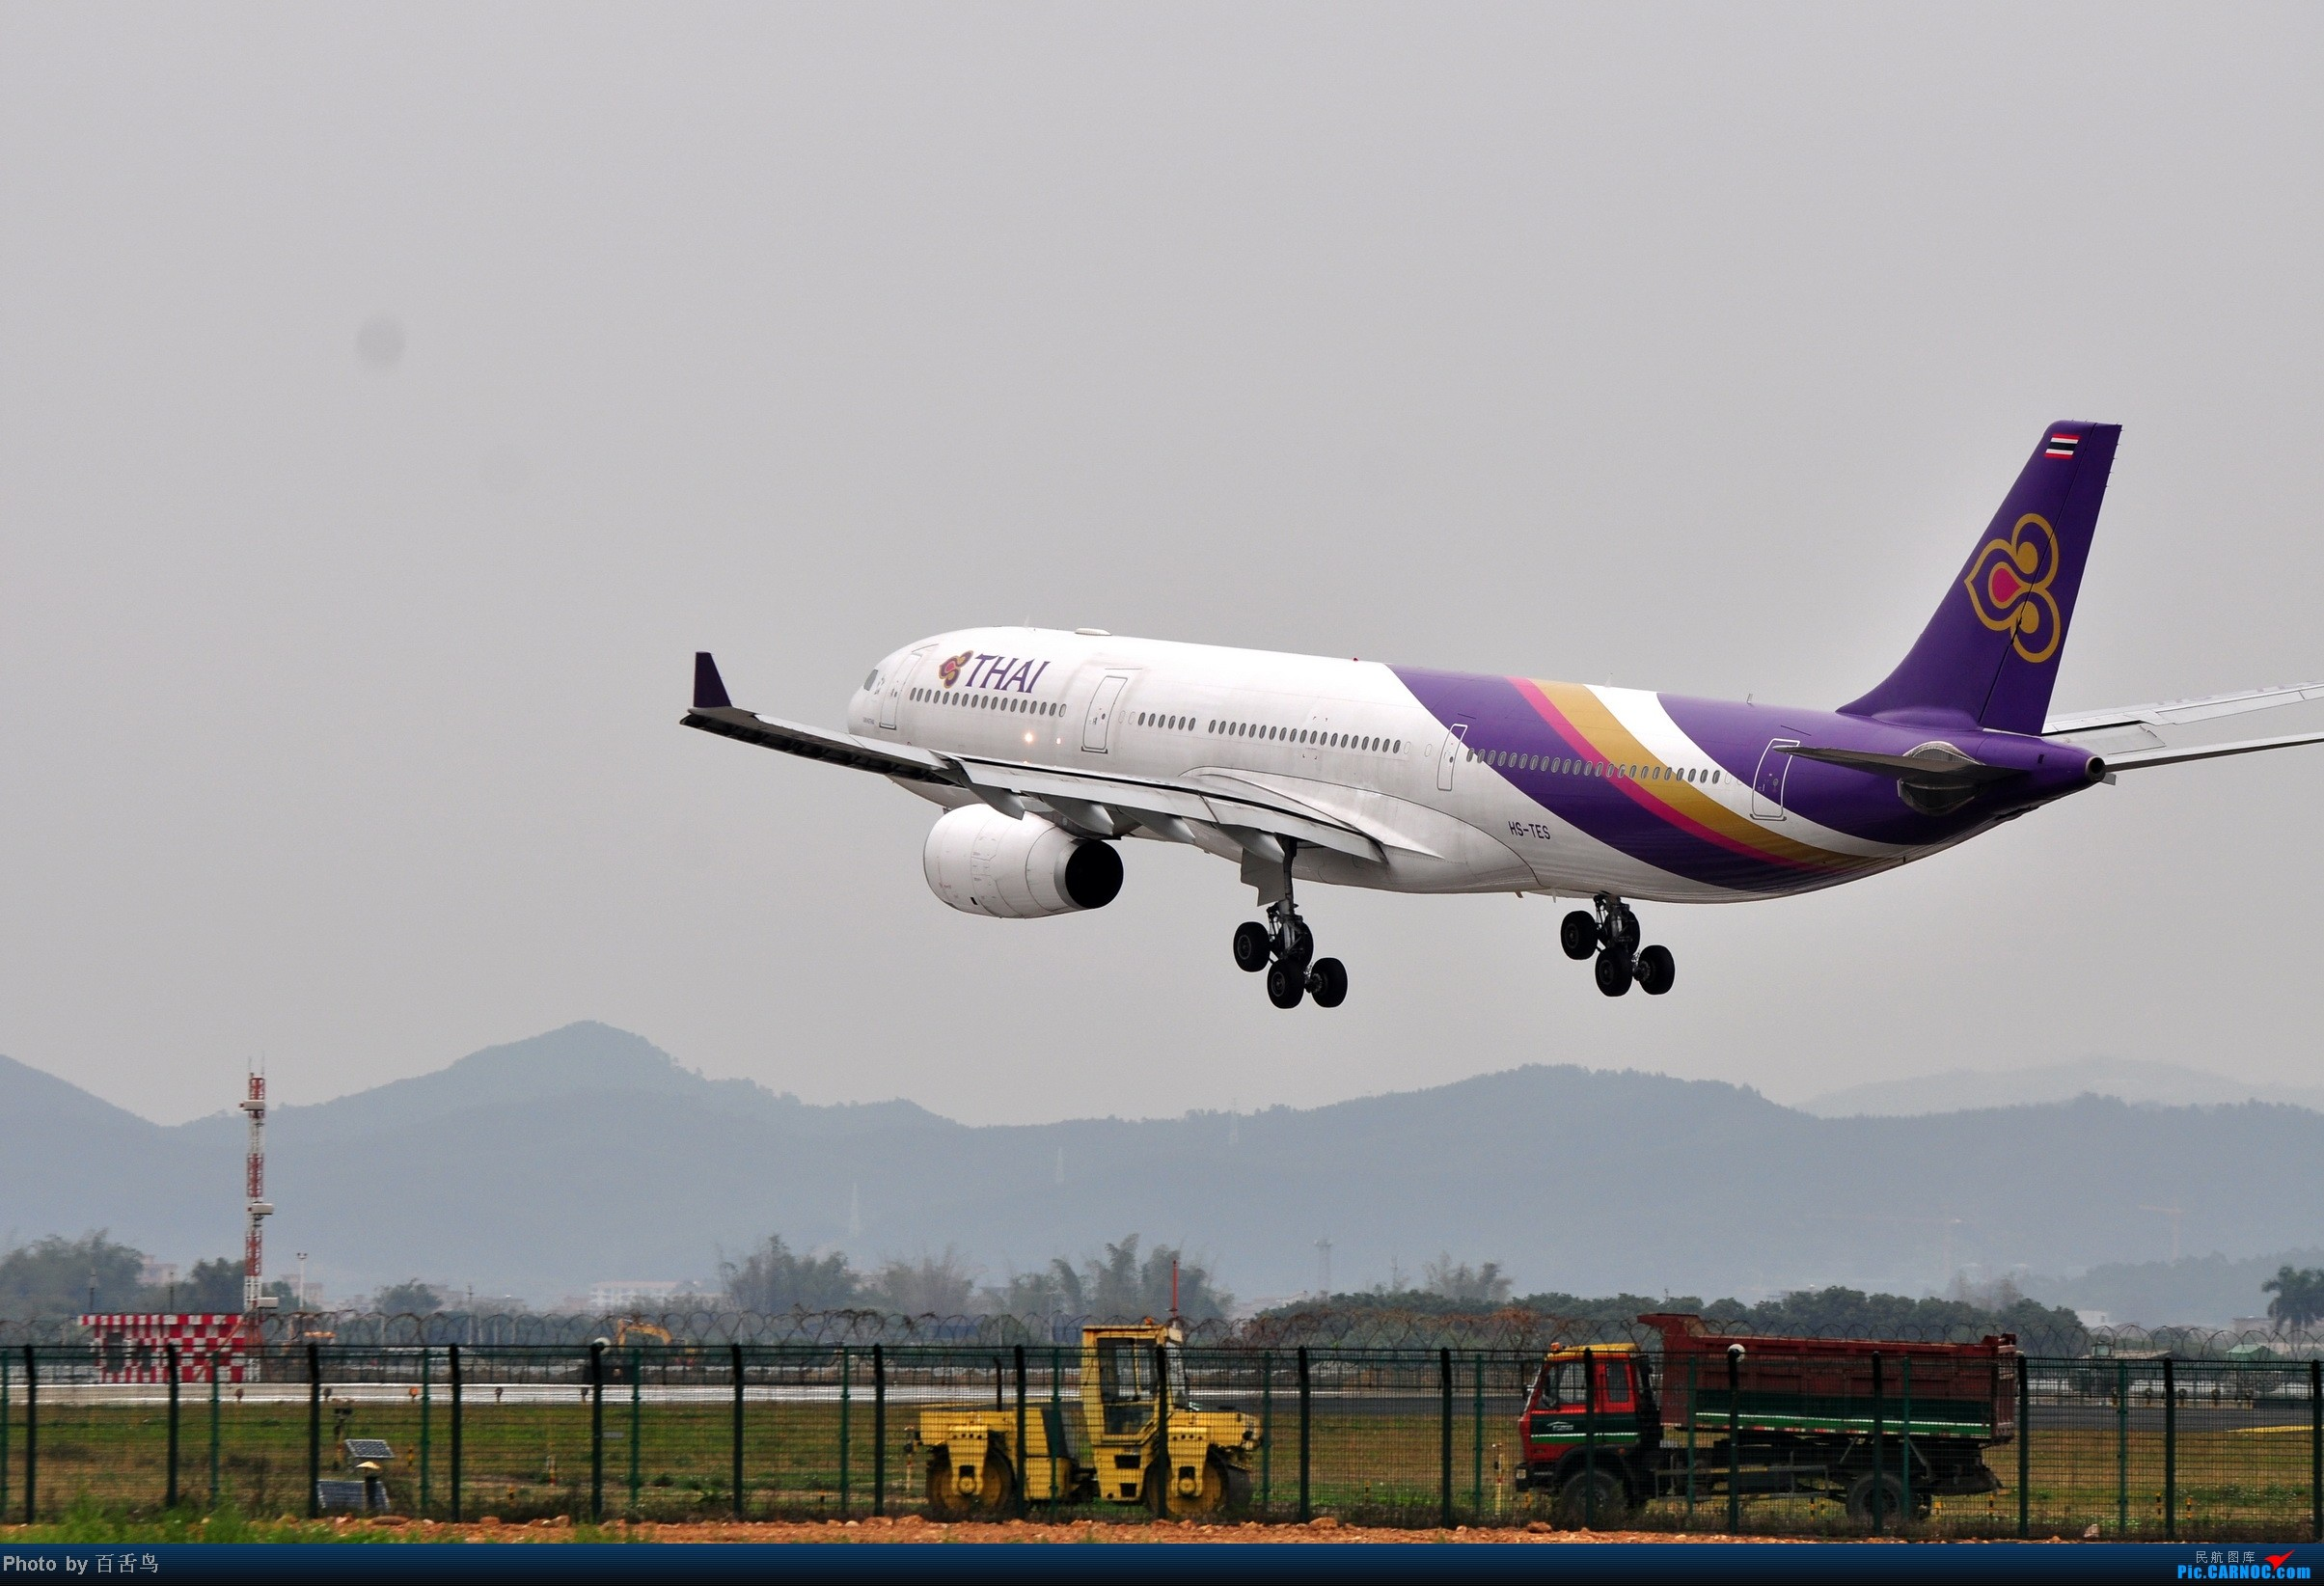 Re:[原创]【白云拍机】追南航773未果,东跑随手拍 AIRBUS A330-300 HS-TES 中国广州白云机场